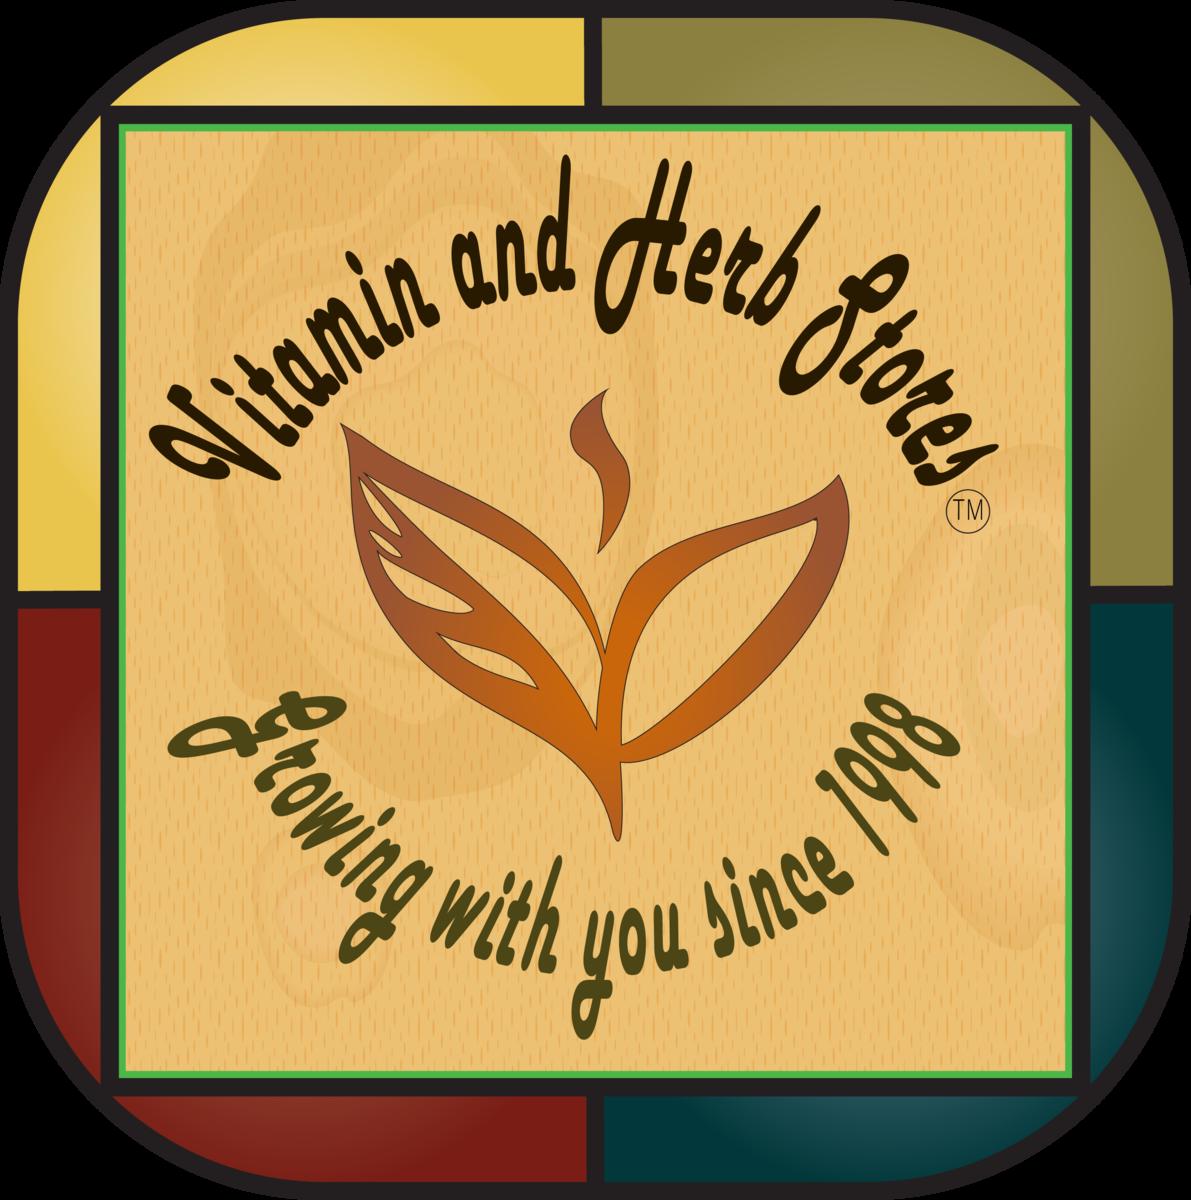 Vitamin & Herb Store logo